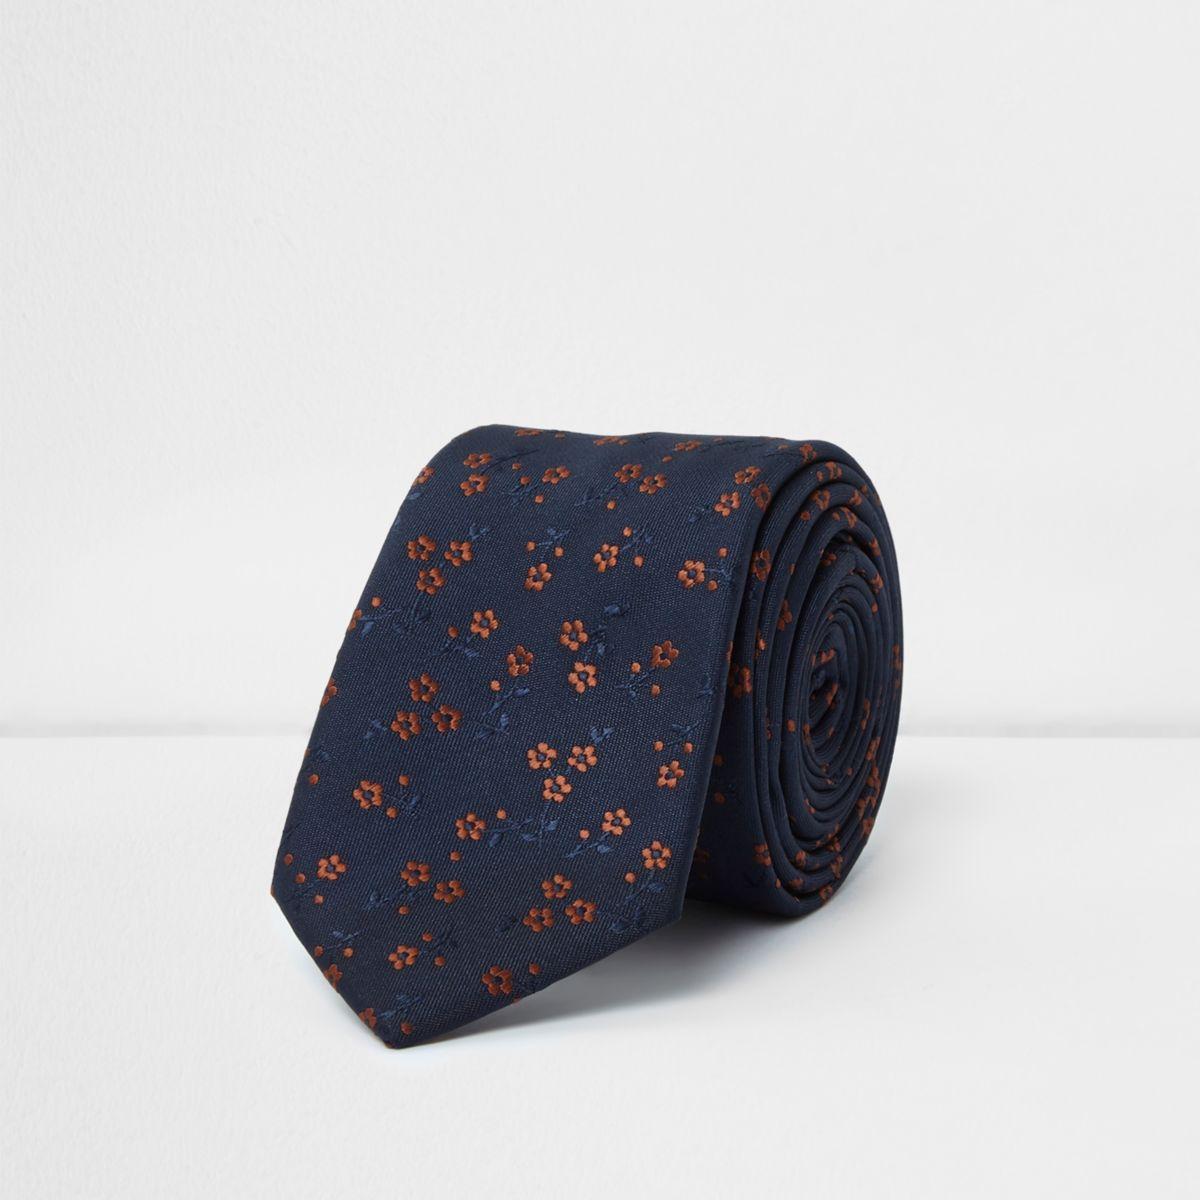 Marineblaue, geblümte Krawatte